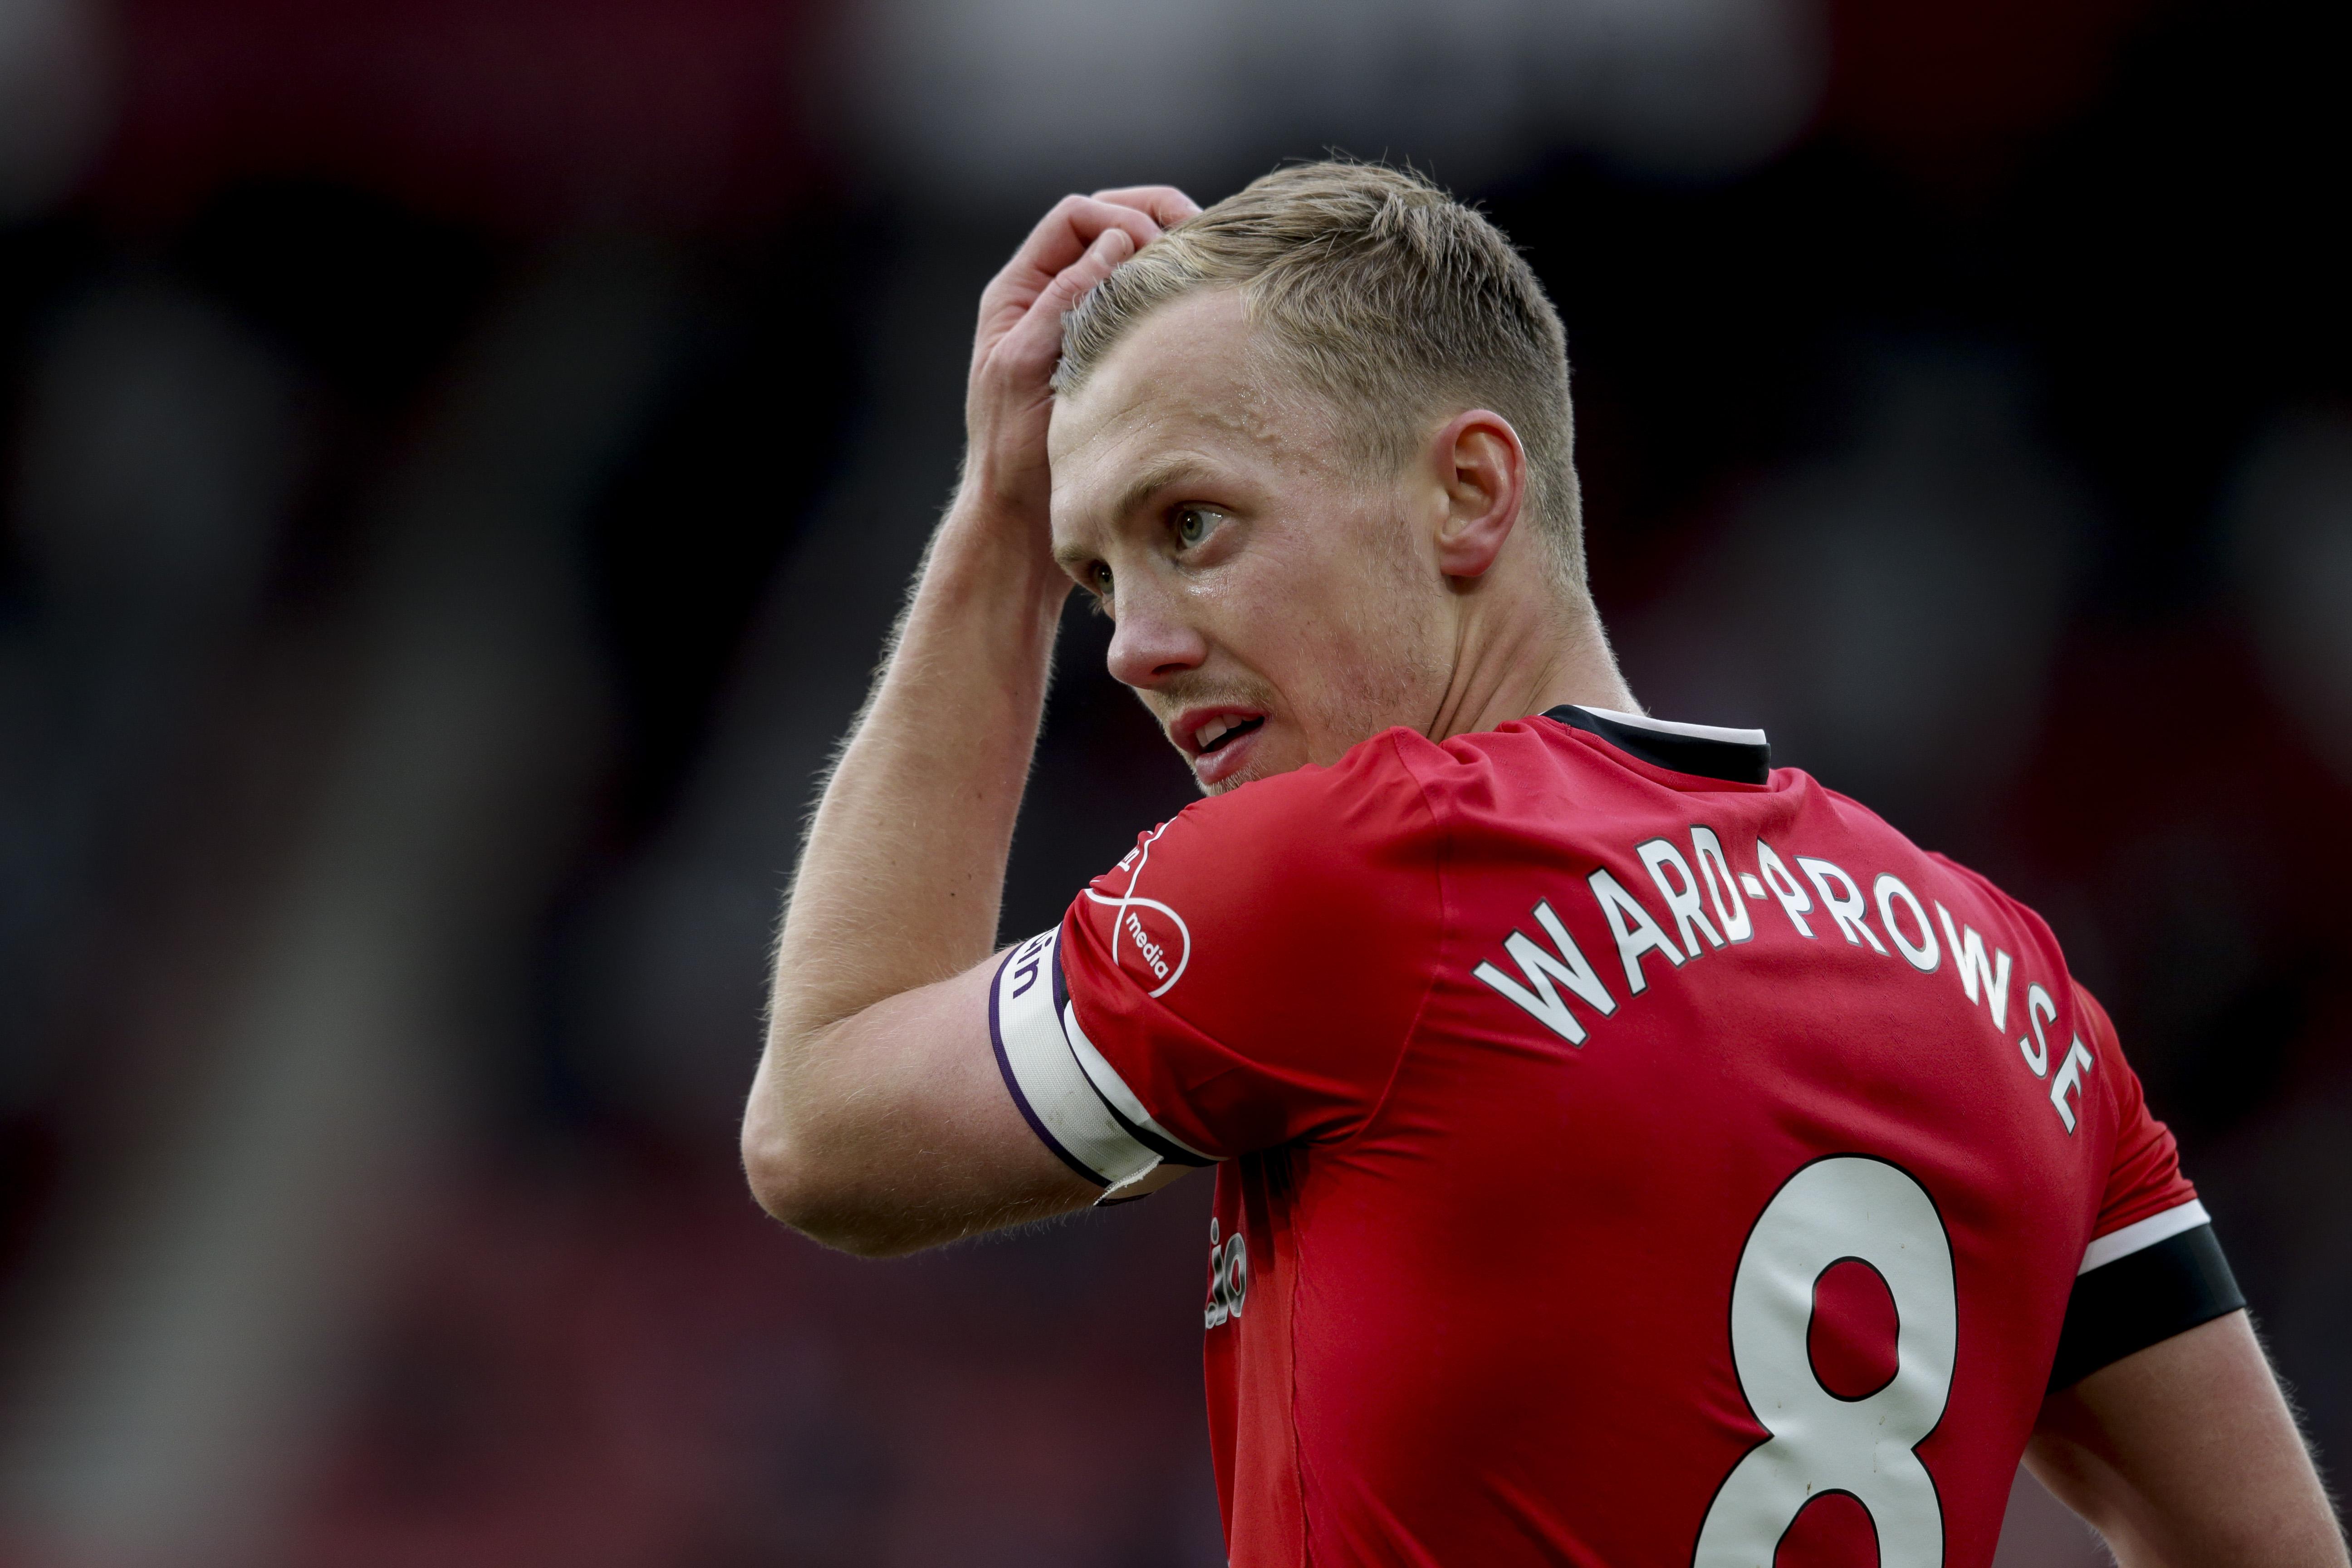 Southampton, Everton, team news, injury update, James Ward-Prowse